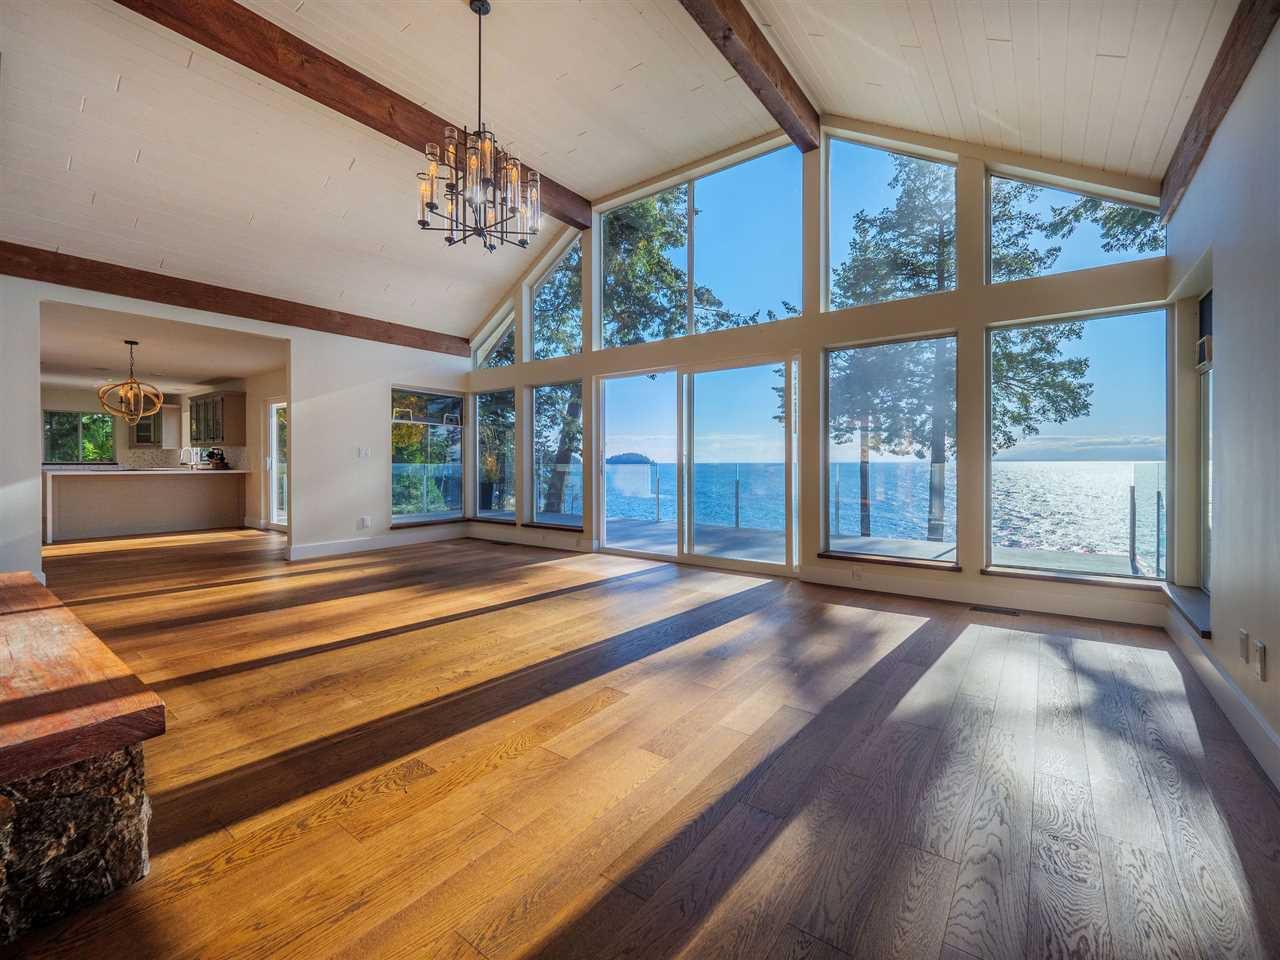 "Photo 15: Photos: 7101 DALE Road in Sechelt: Sechelt District House for sale in ""Caleda Estates"" (Sunshine Coast)  : MLS®# R2515160"